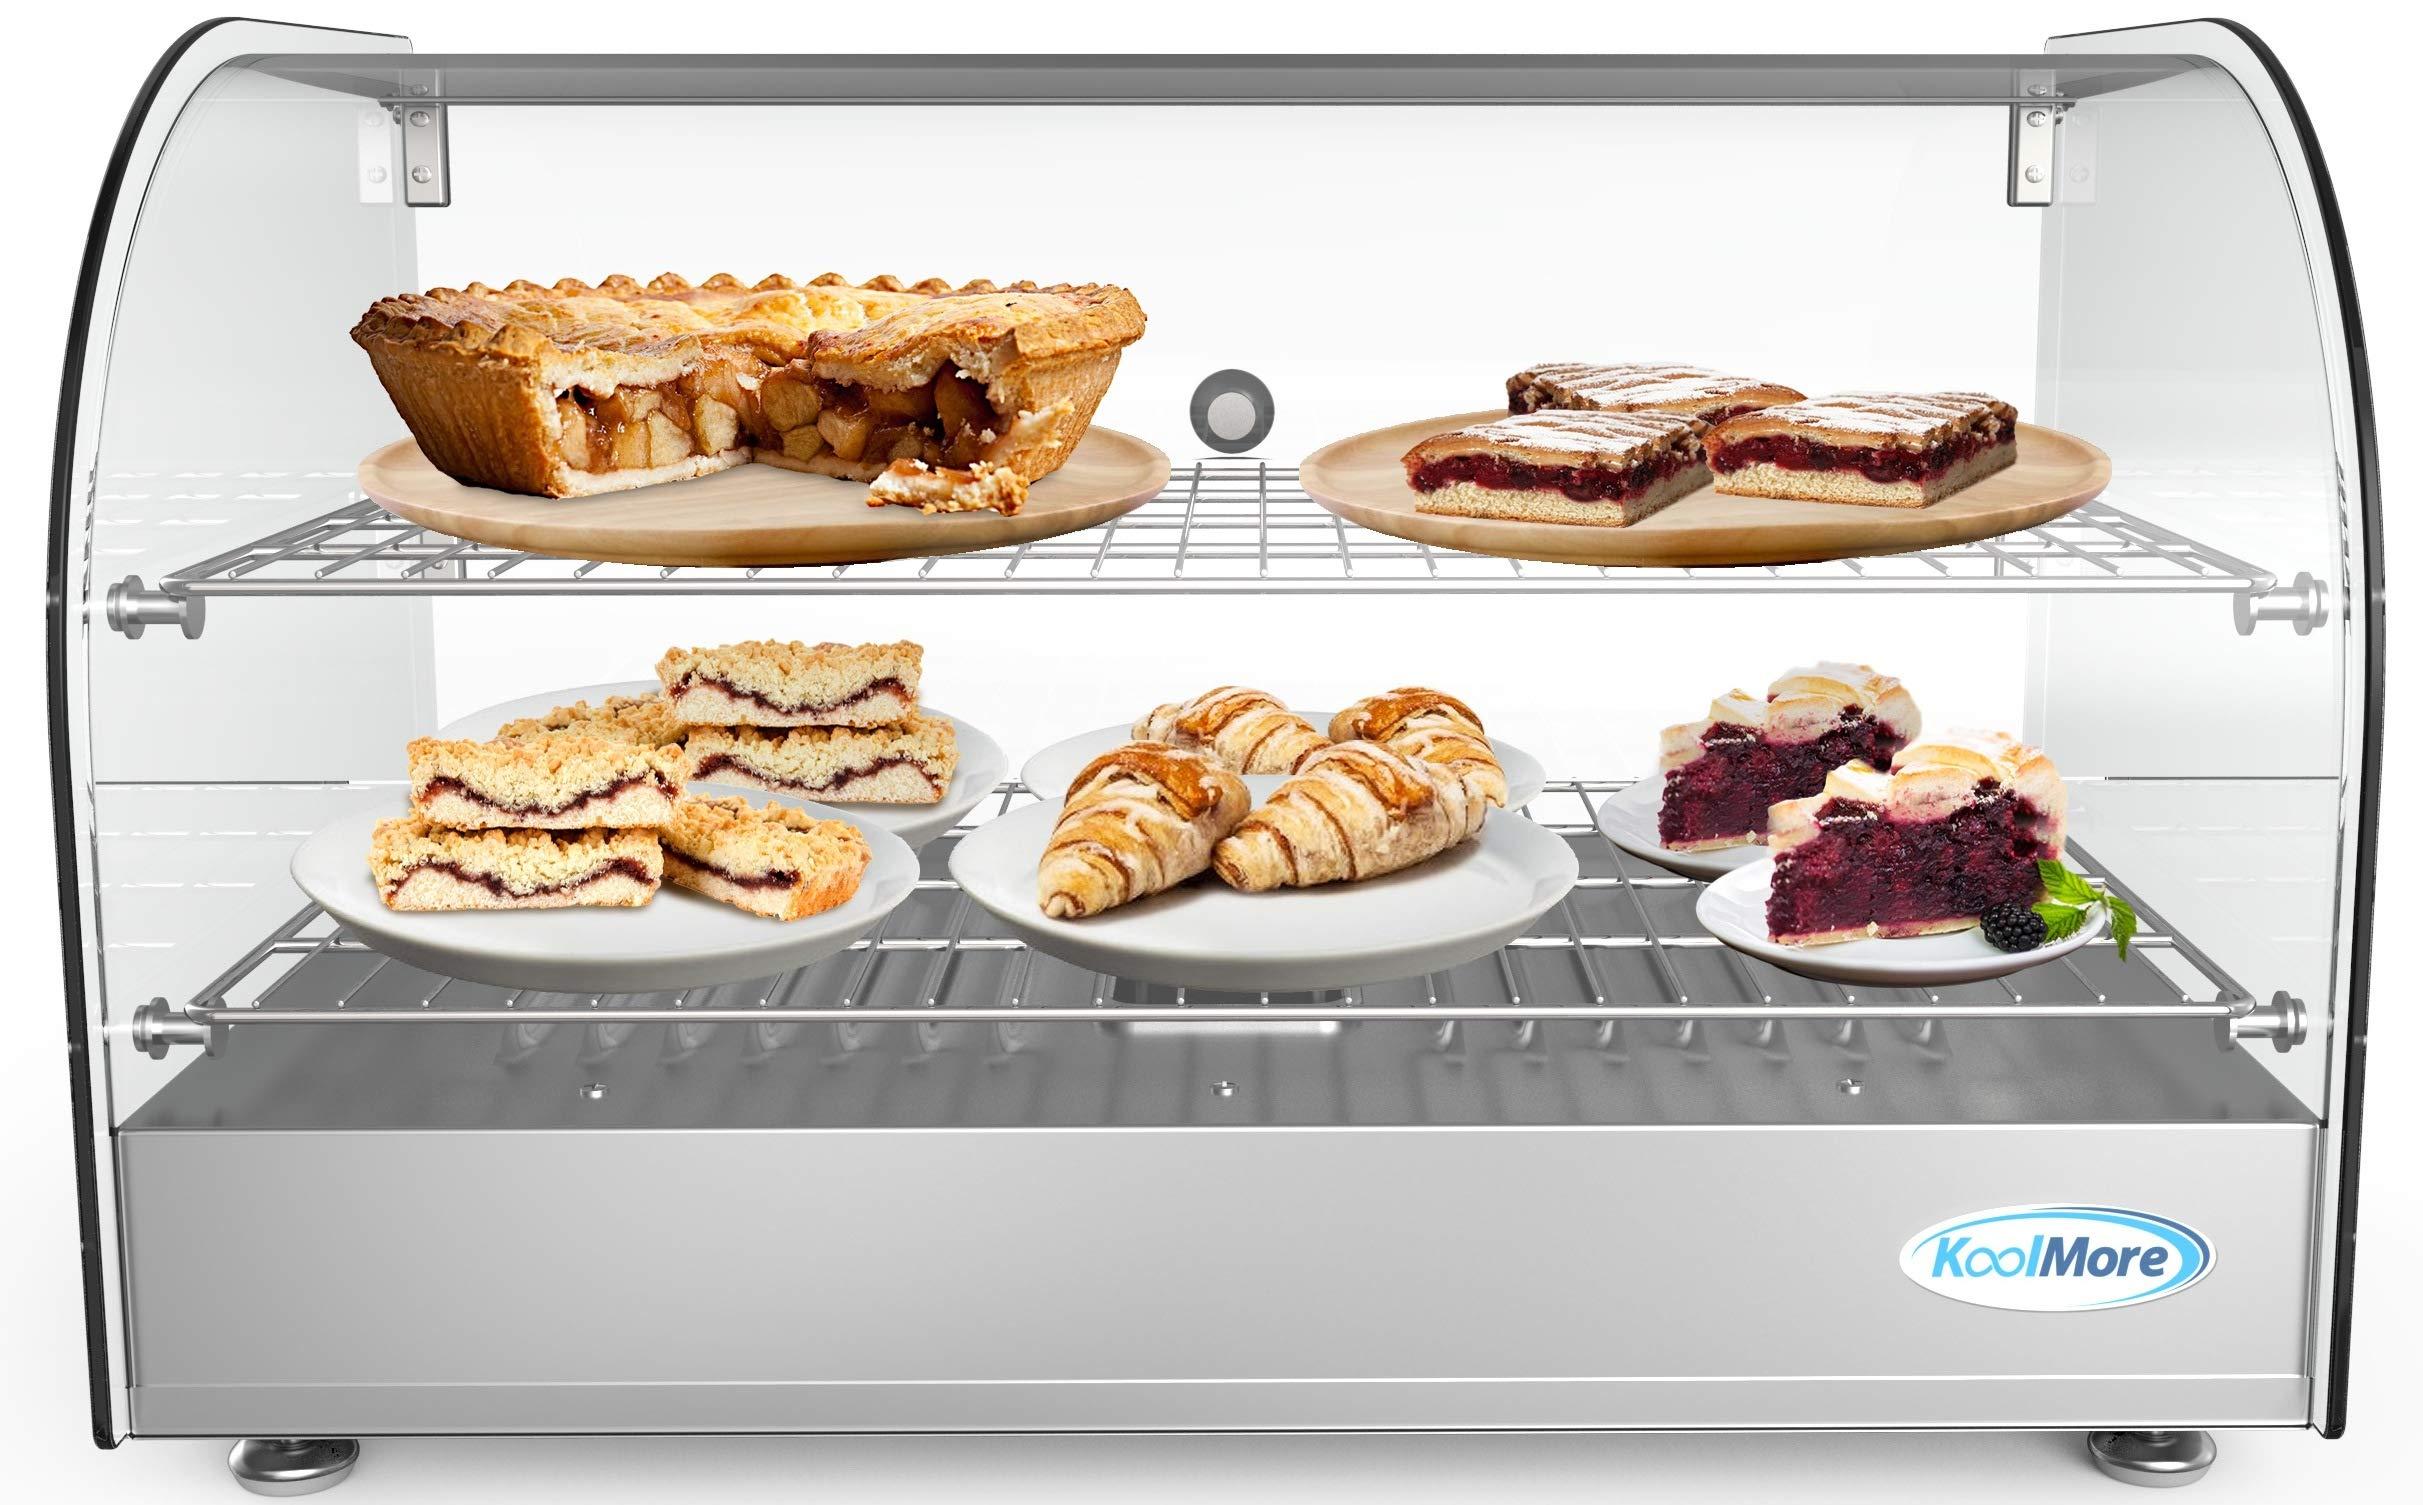 "KoolMore 22"" Commercial 2 Shelf Countertop Food Warmer Display Case - 1.5. cu ft, Silver, Model:HDC-1.5C"